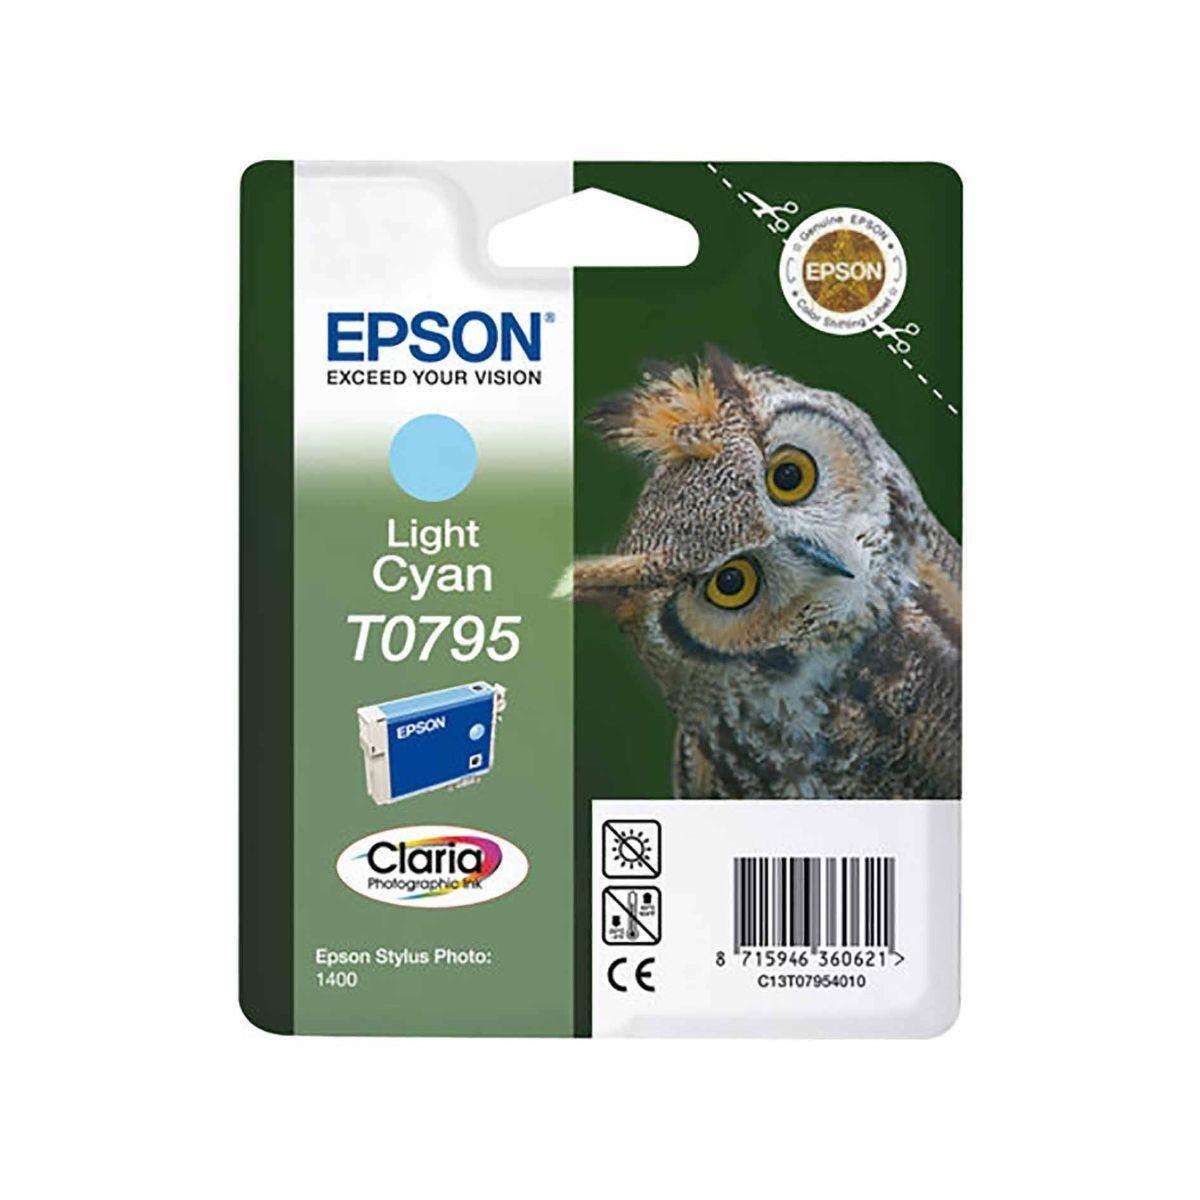 Epson T0795 Ink Cartridge